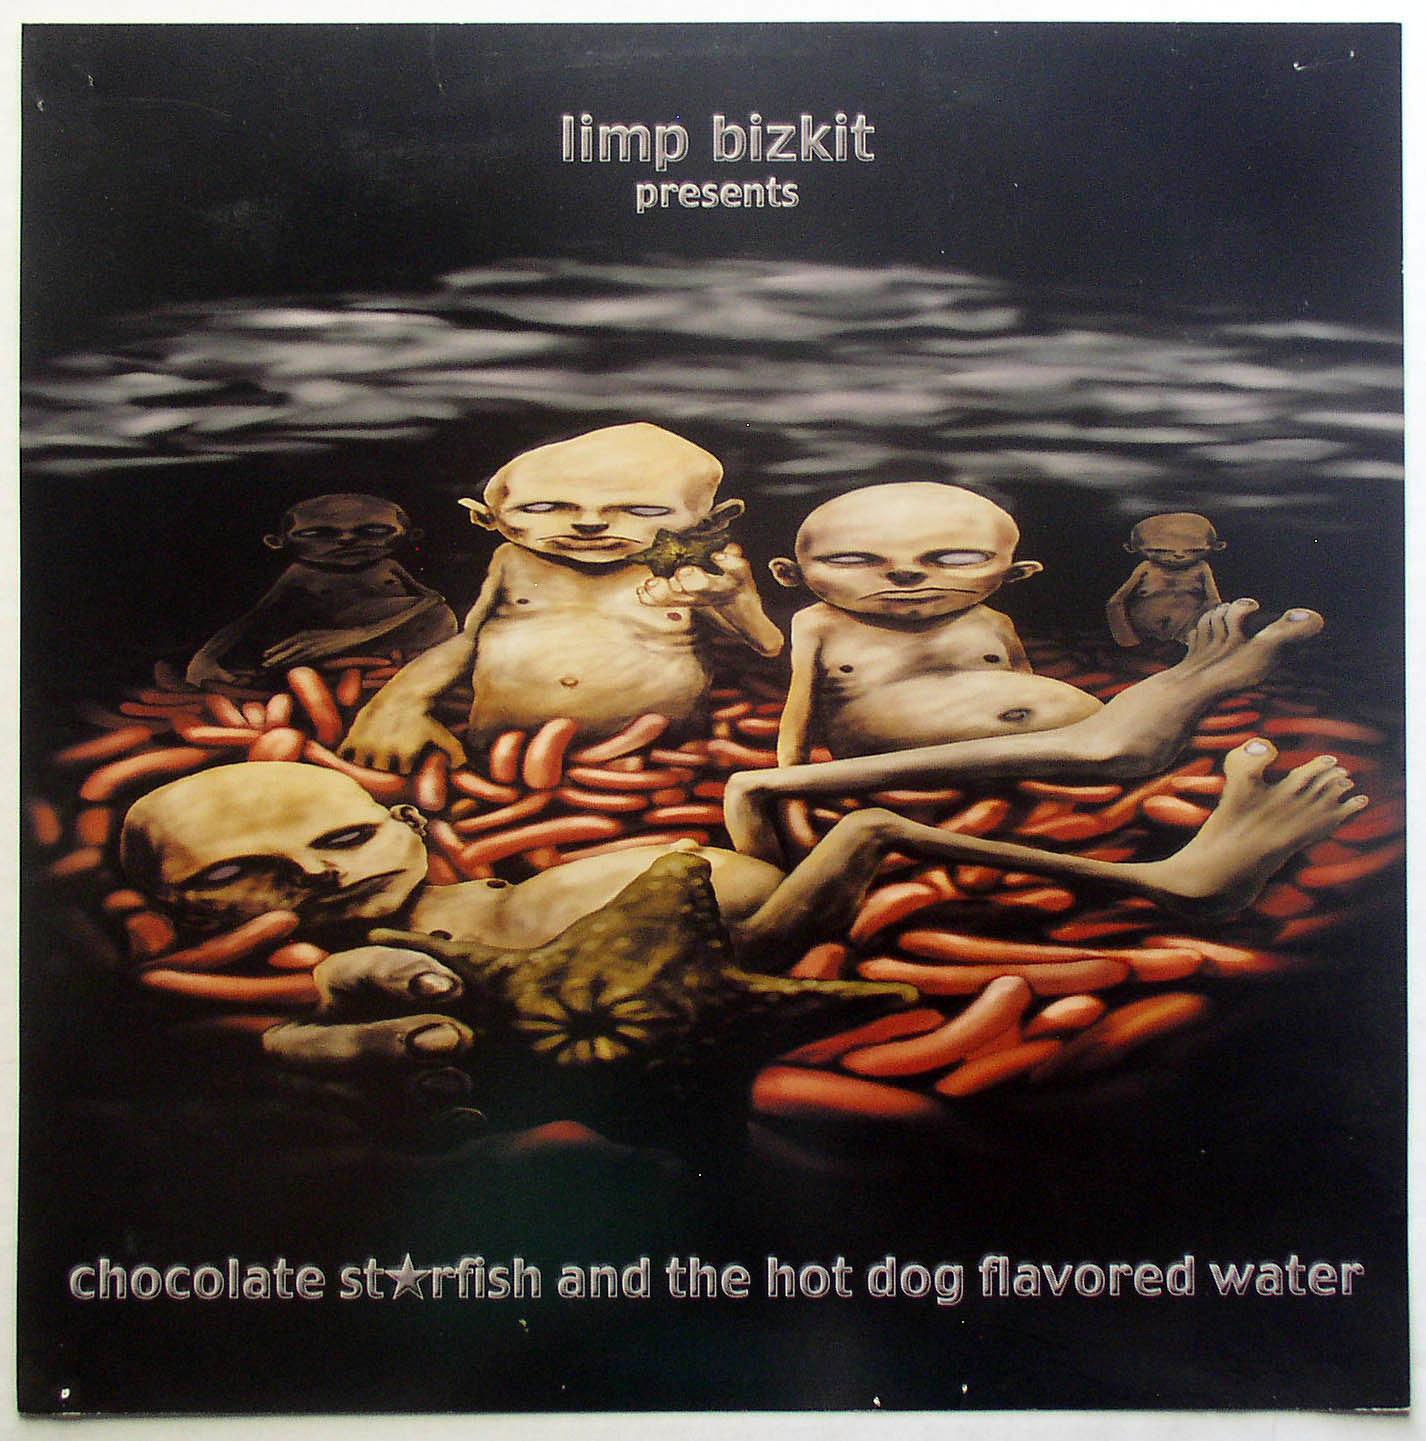 Chocolate Starfish And The Hotdog Flavored Water